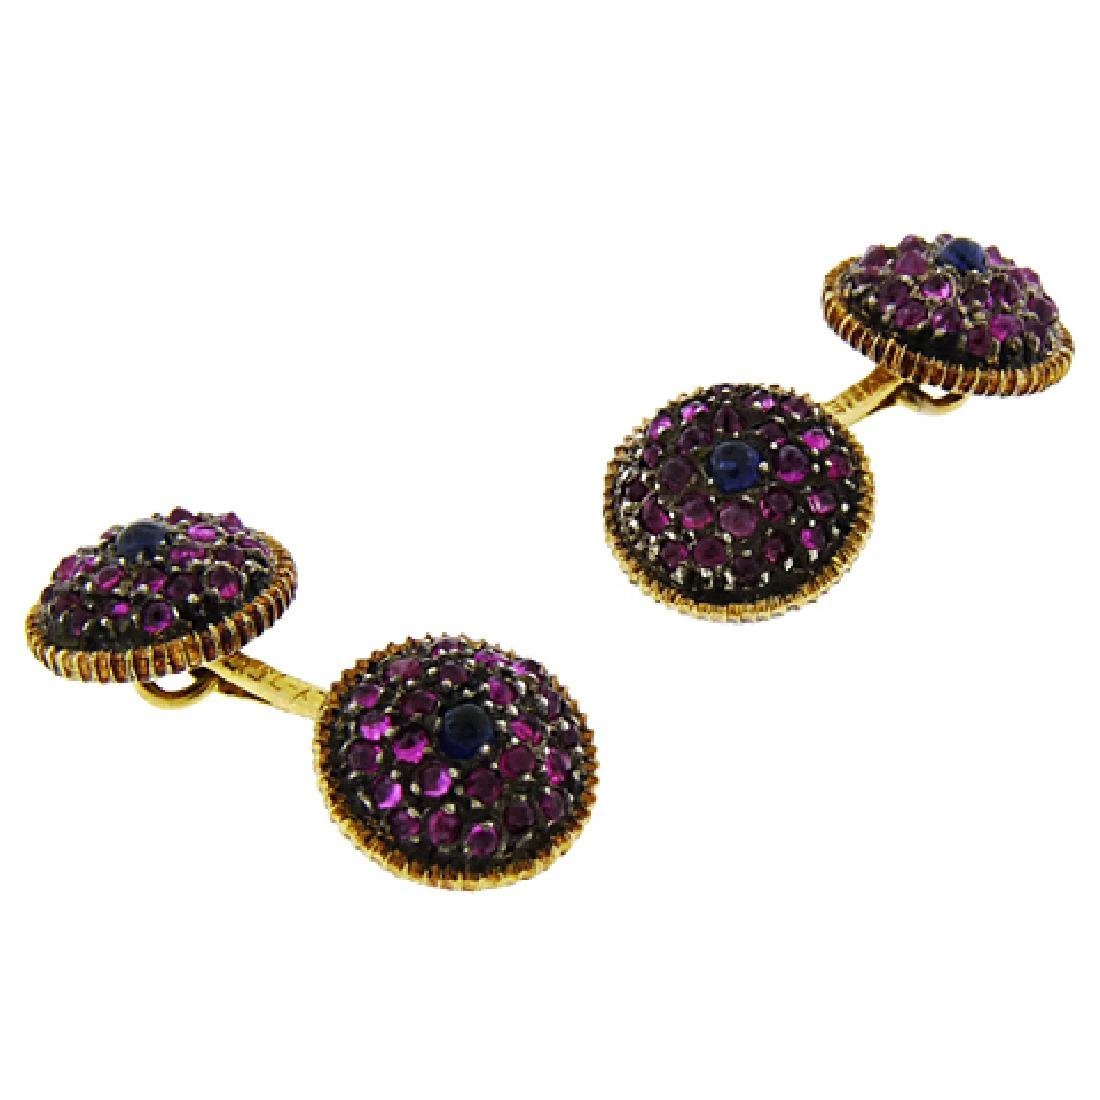 Buccellatti 18K Gold Ruby Sapphire Cufflinks